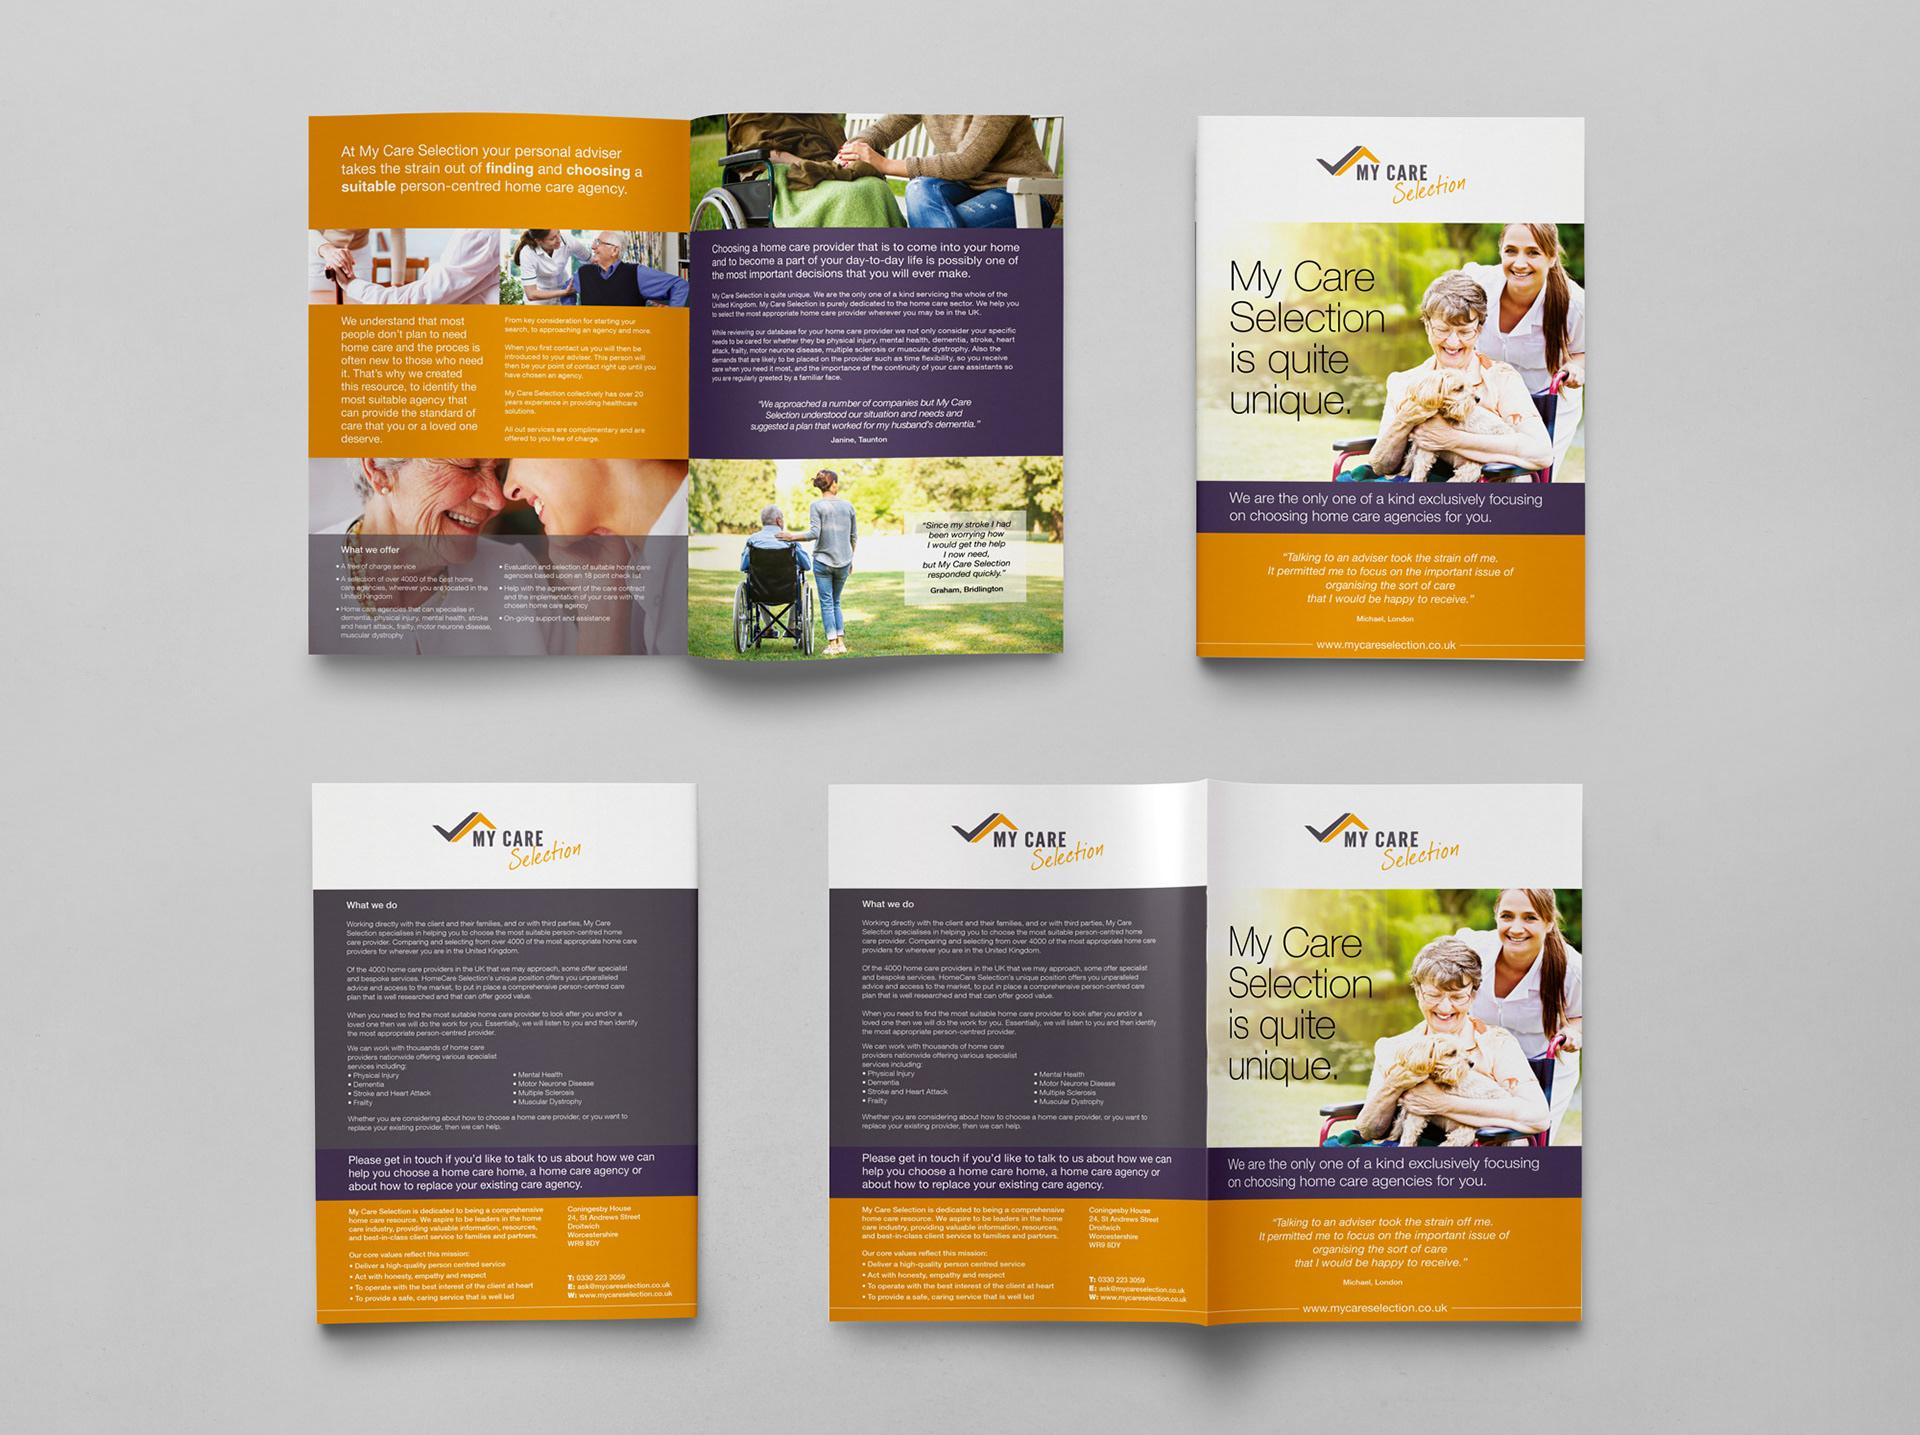 Mossom Design - My Care Selection Brochure Design